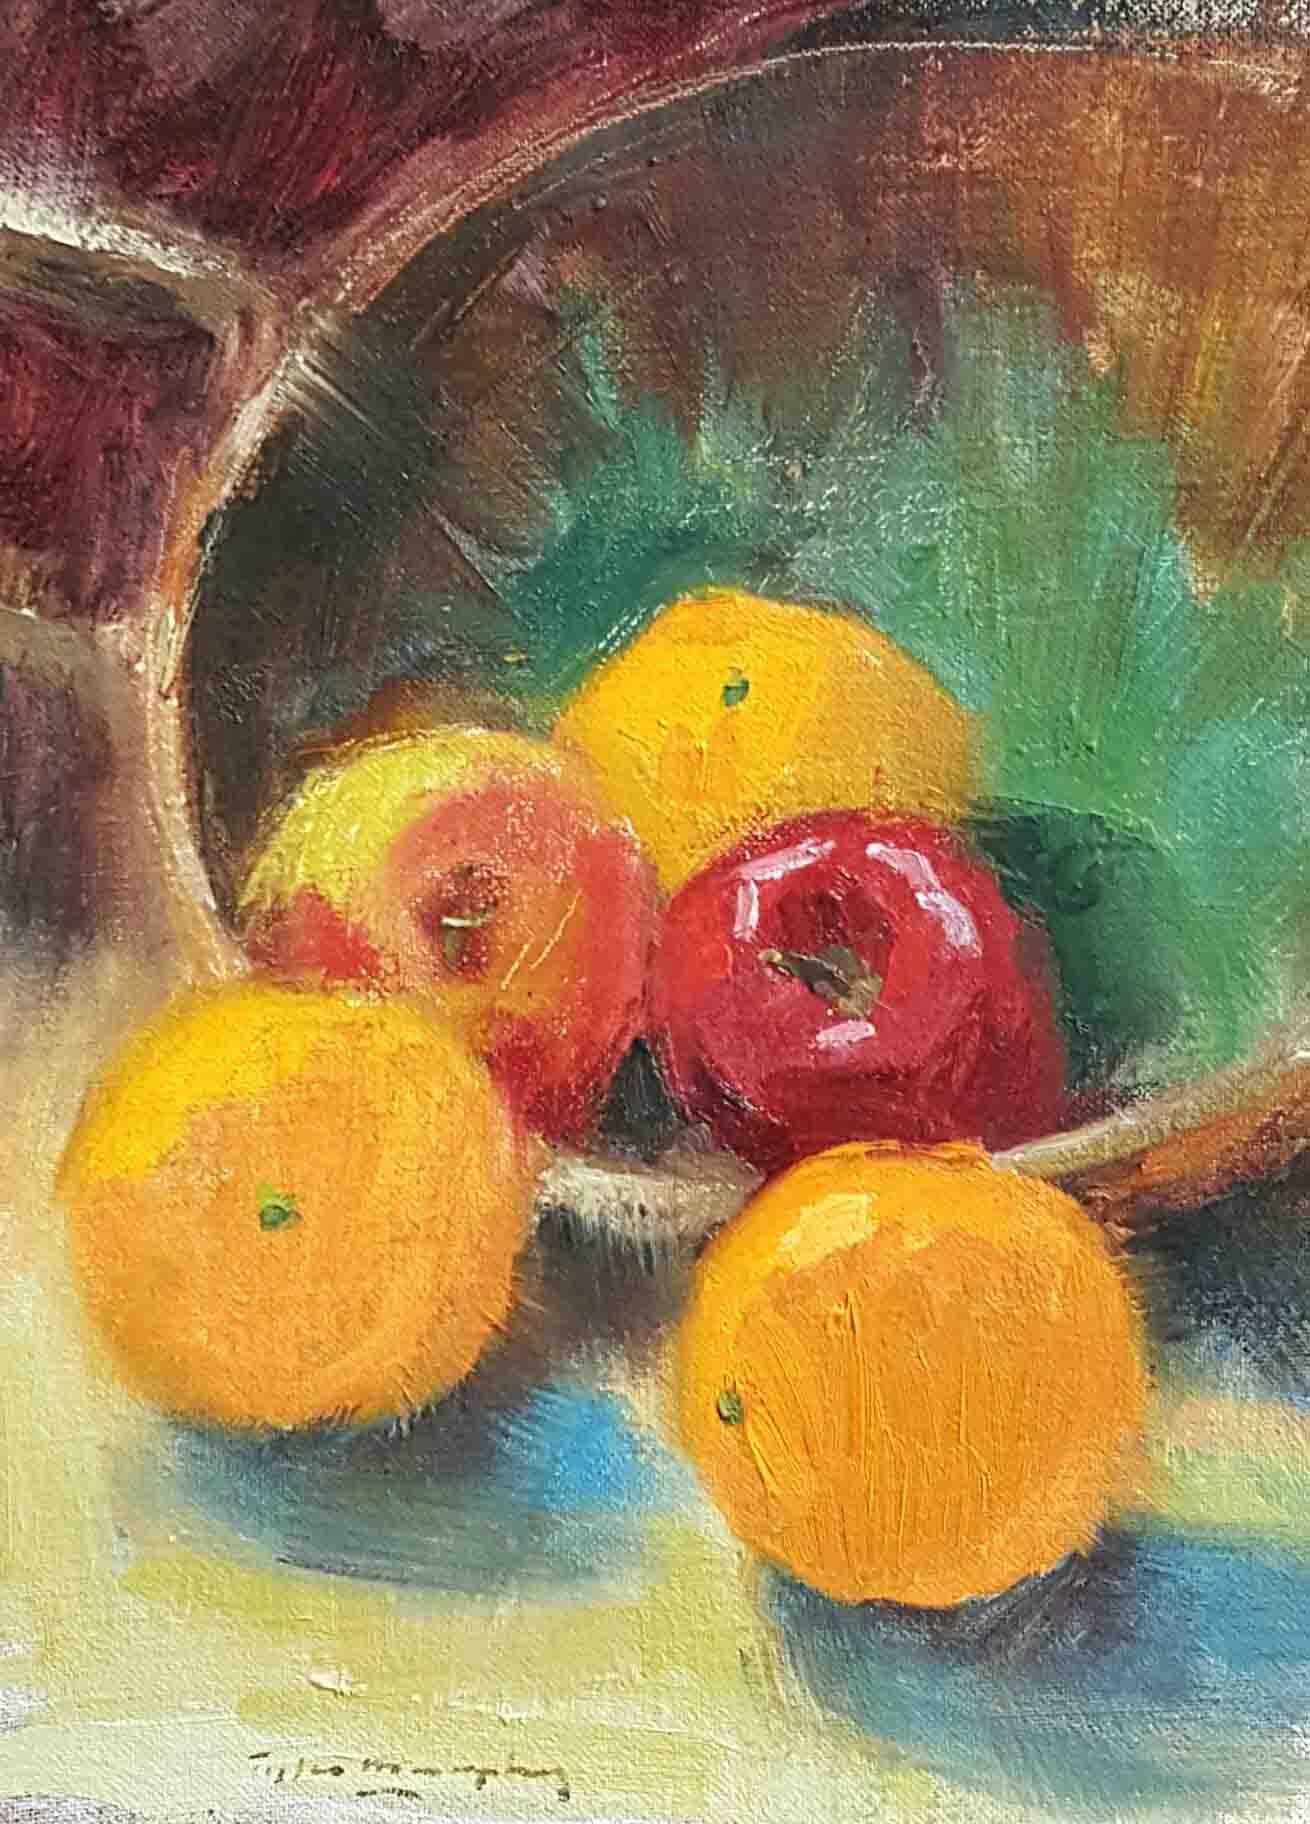 Apples and Oranges 9x12.jpg